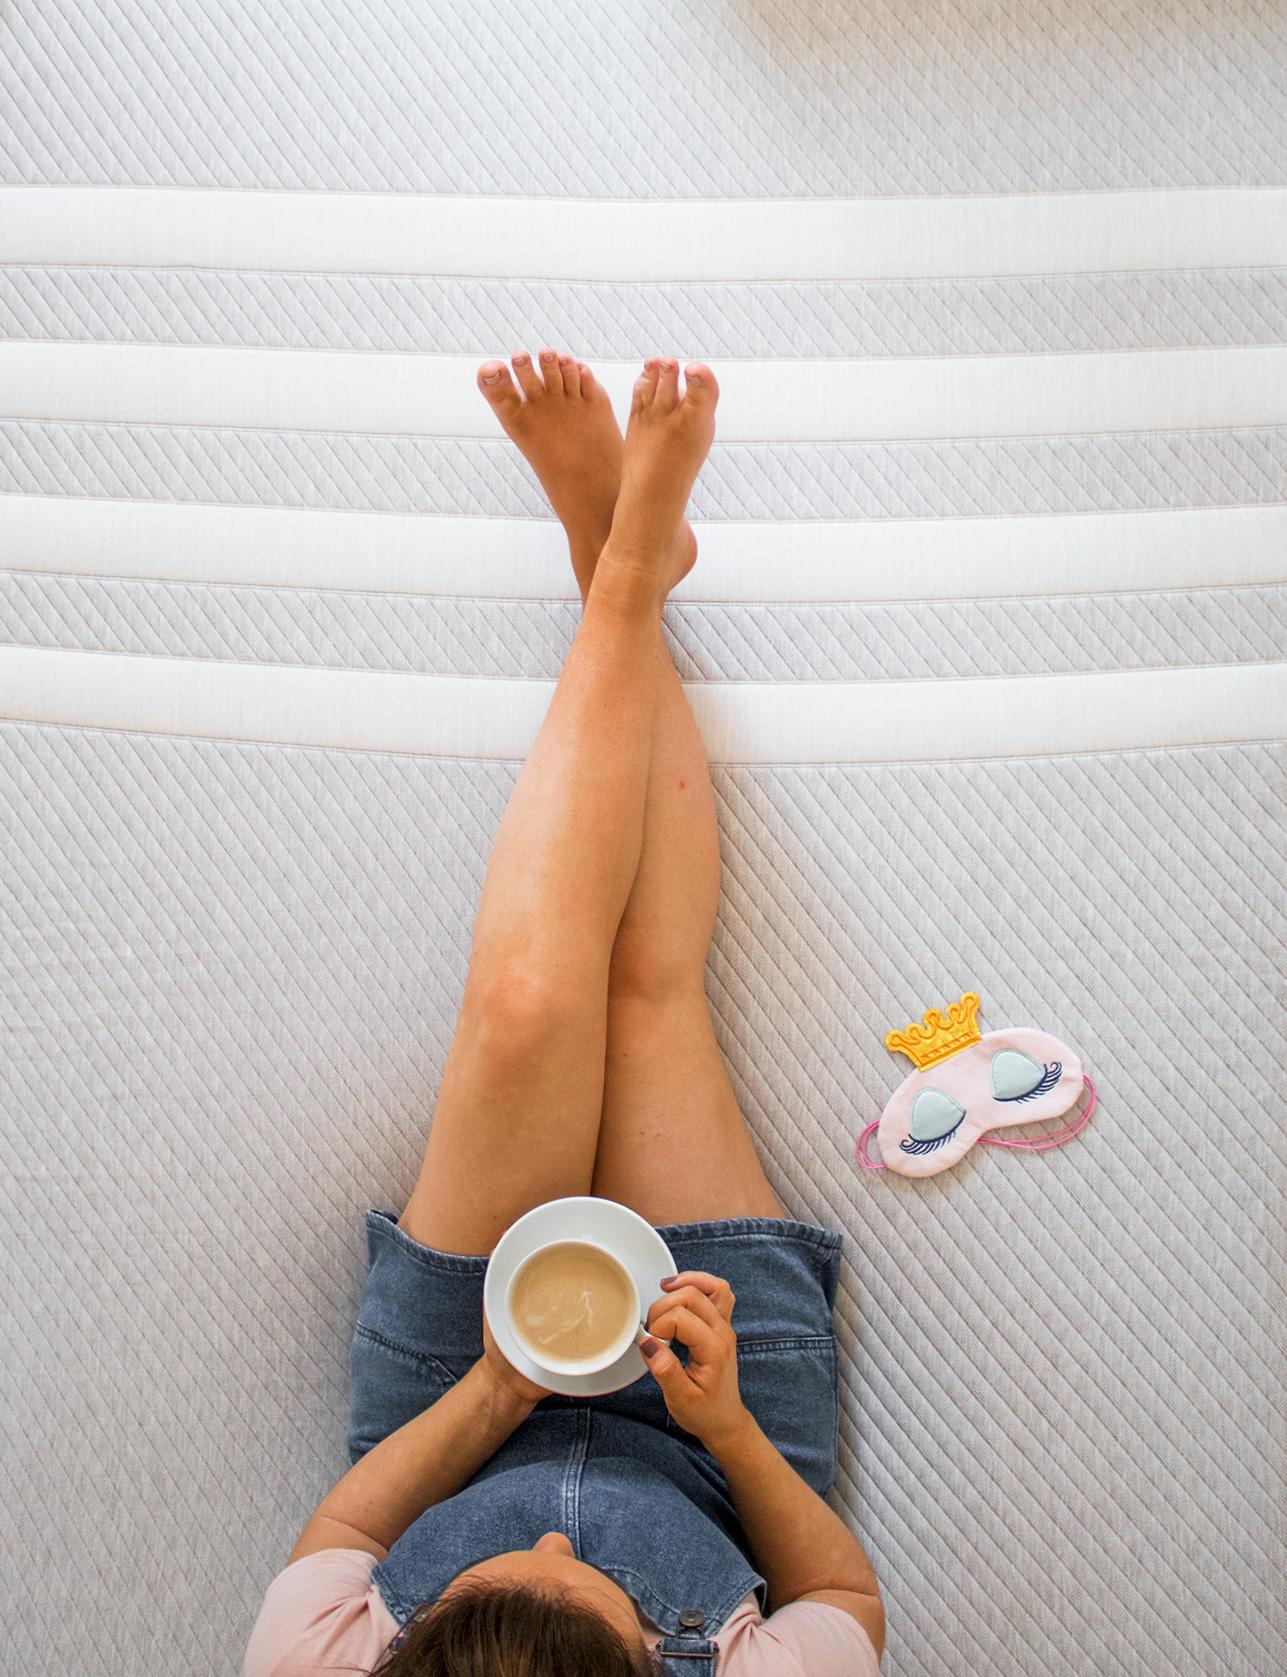 leesa mattress review how to get a good nights sleep sleeping tips